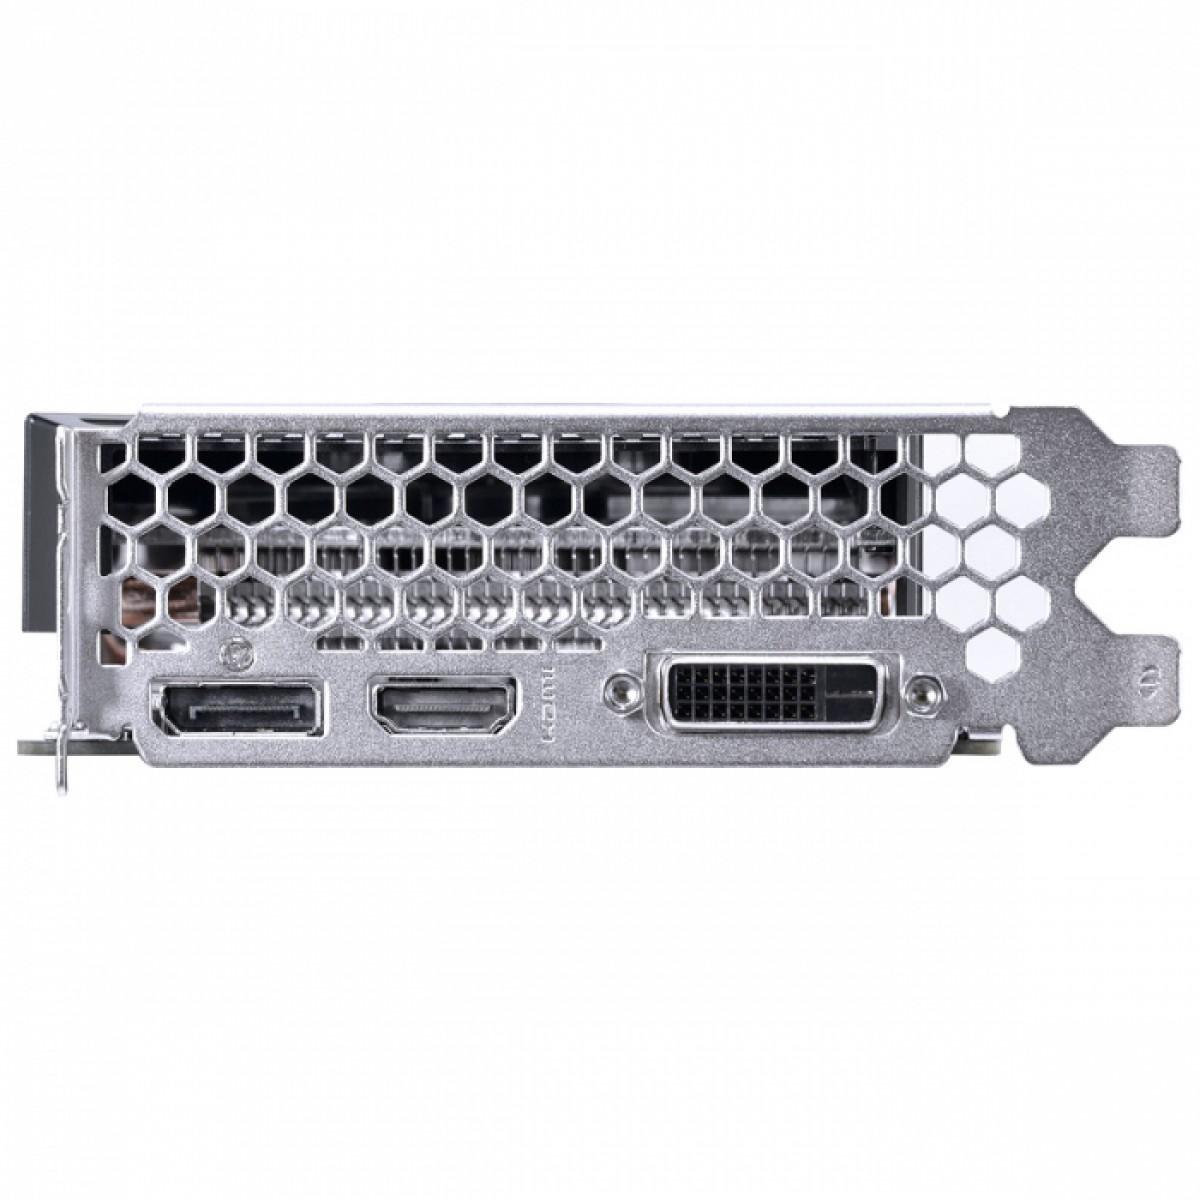 Placa de Vídeo Geforce GTX 1660 OC GDDR5 6GB - PCyes